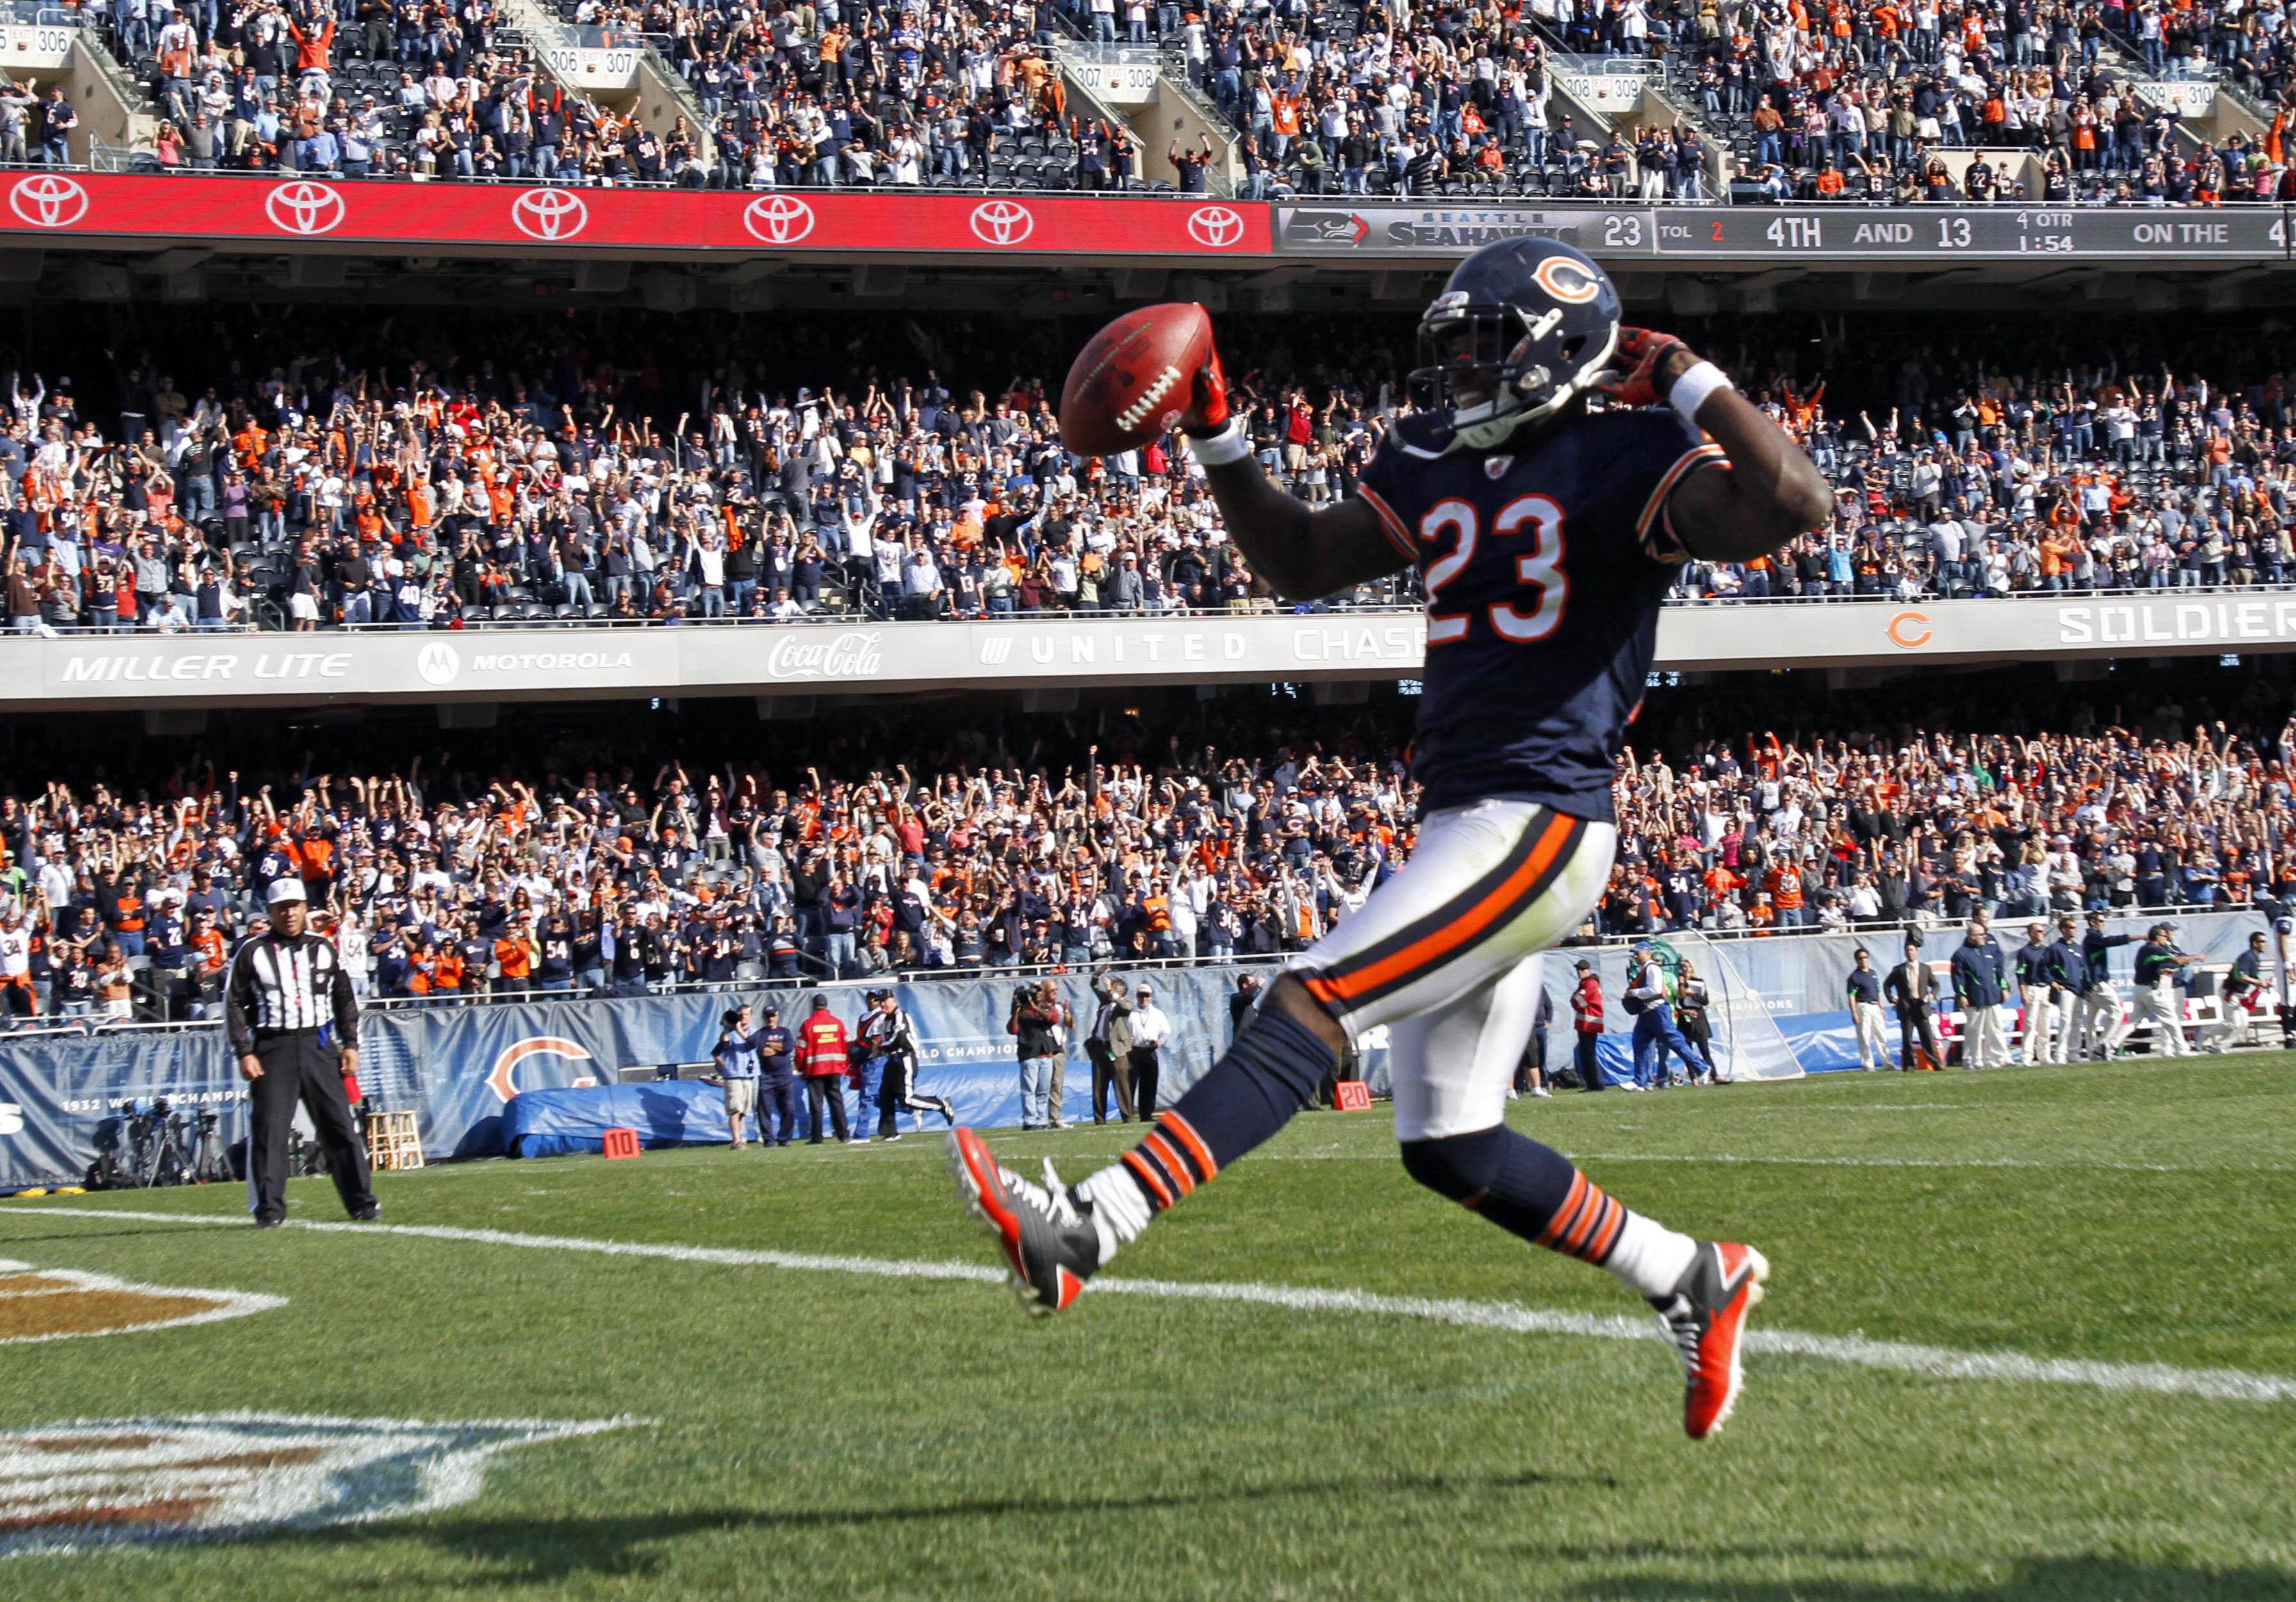 Former Bears returner Devin Hester scores a touchdown in 2010.